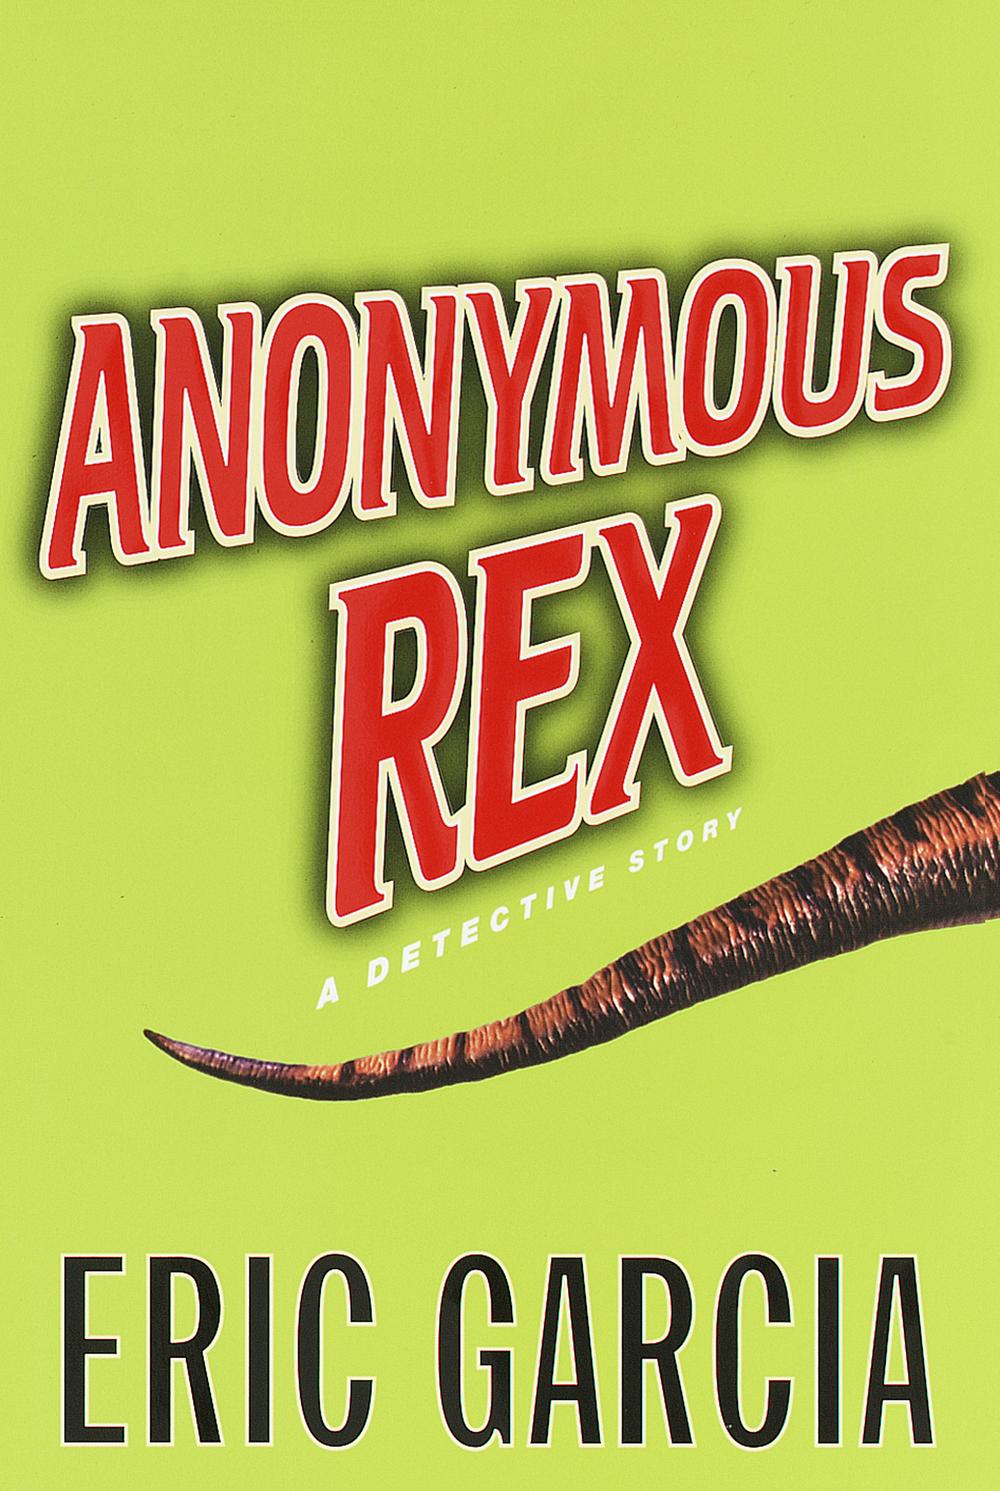 ANONYMOUS_REX-hc-ss6.jpg